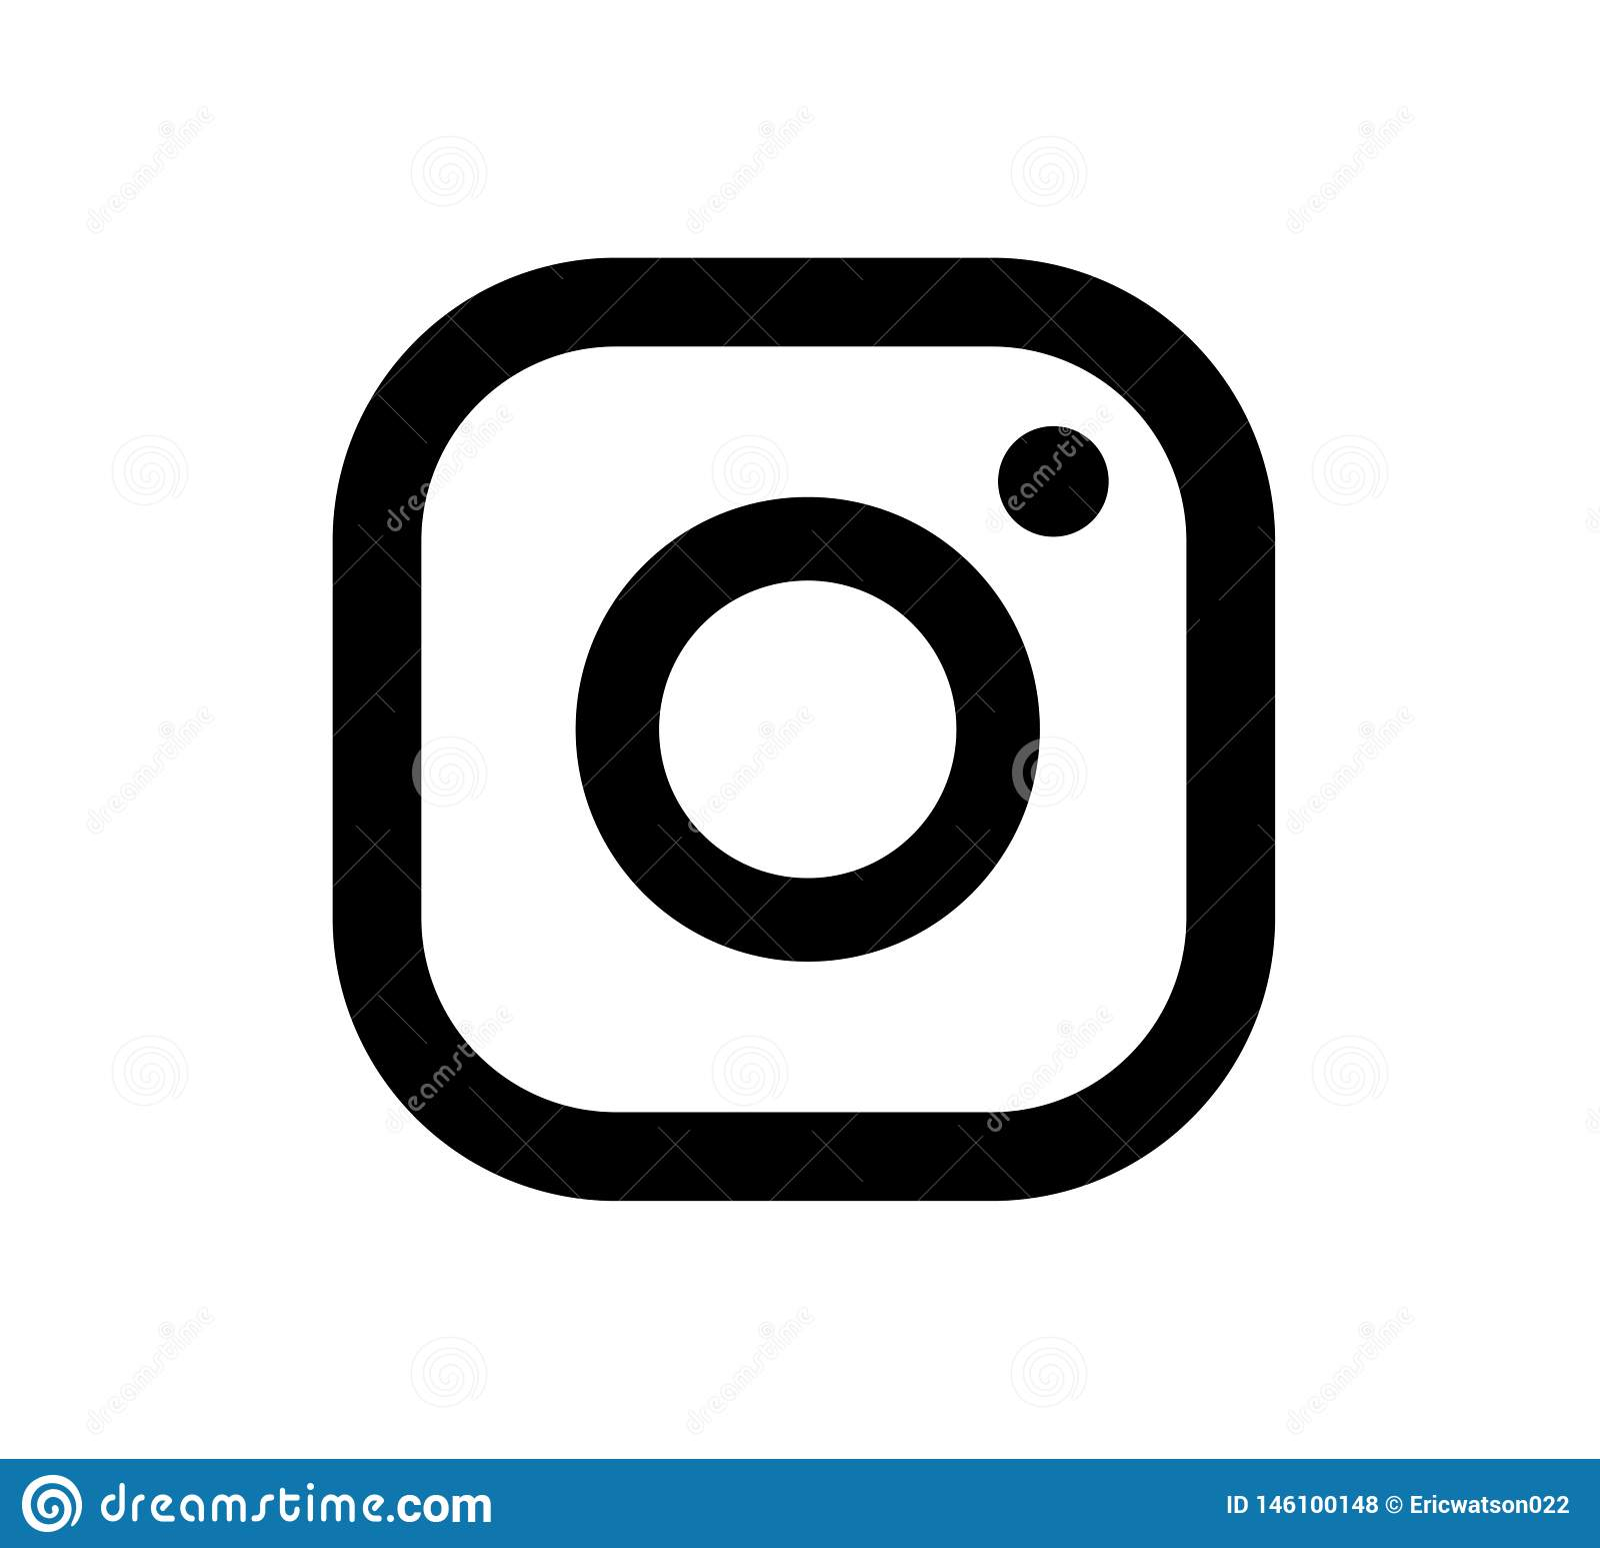 Vector Illustration Instagram: Instagram Logo Icon Vector Black Design Illustration